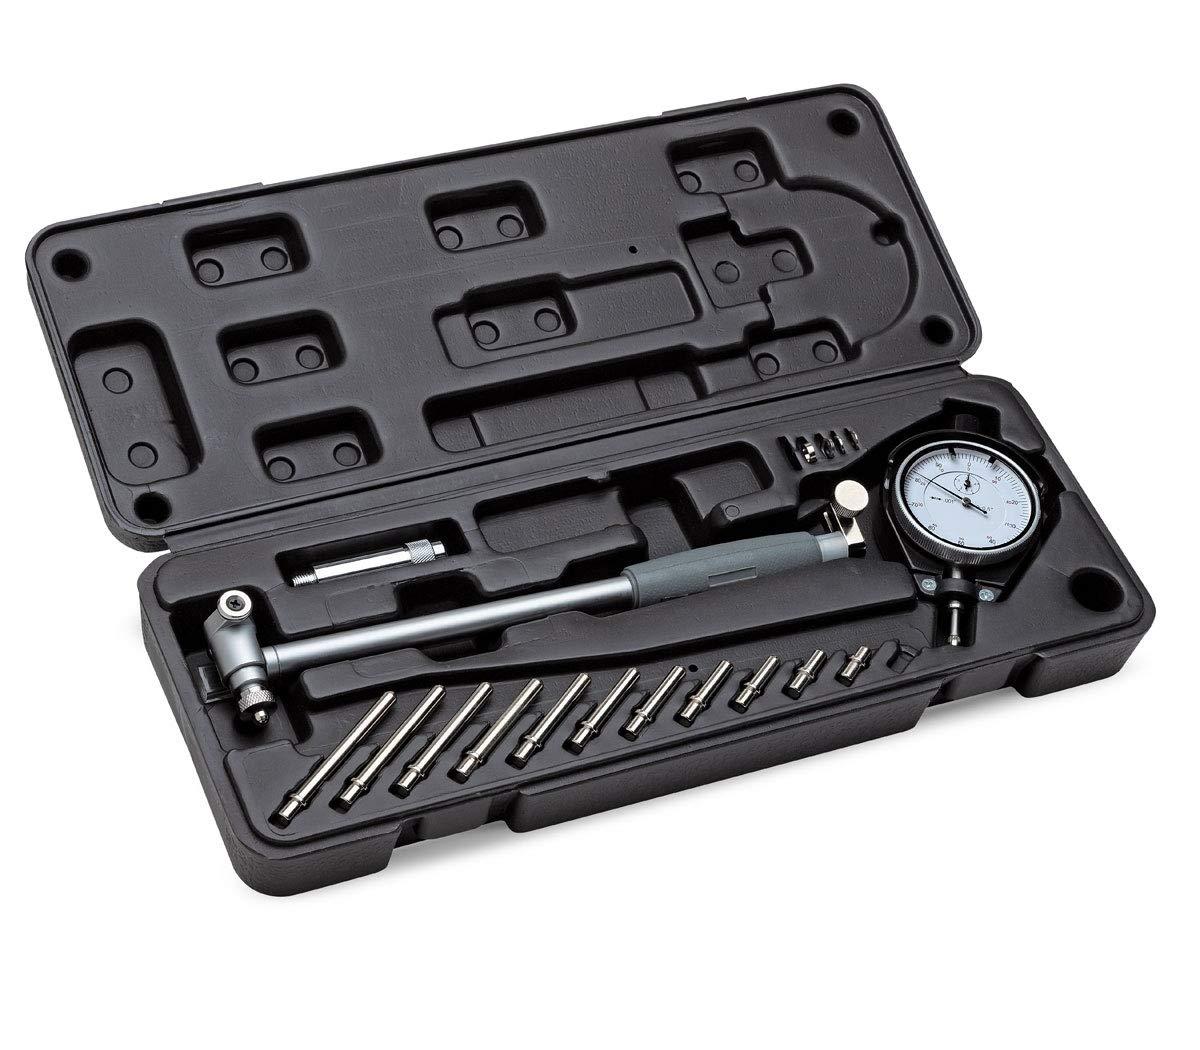 Range Measuring 0.01 Accuracy Diameter Indicator Tool Kit Eastwood Dial Type Cylinder Bore Gauge Kit 2-6 in